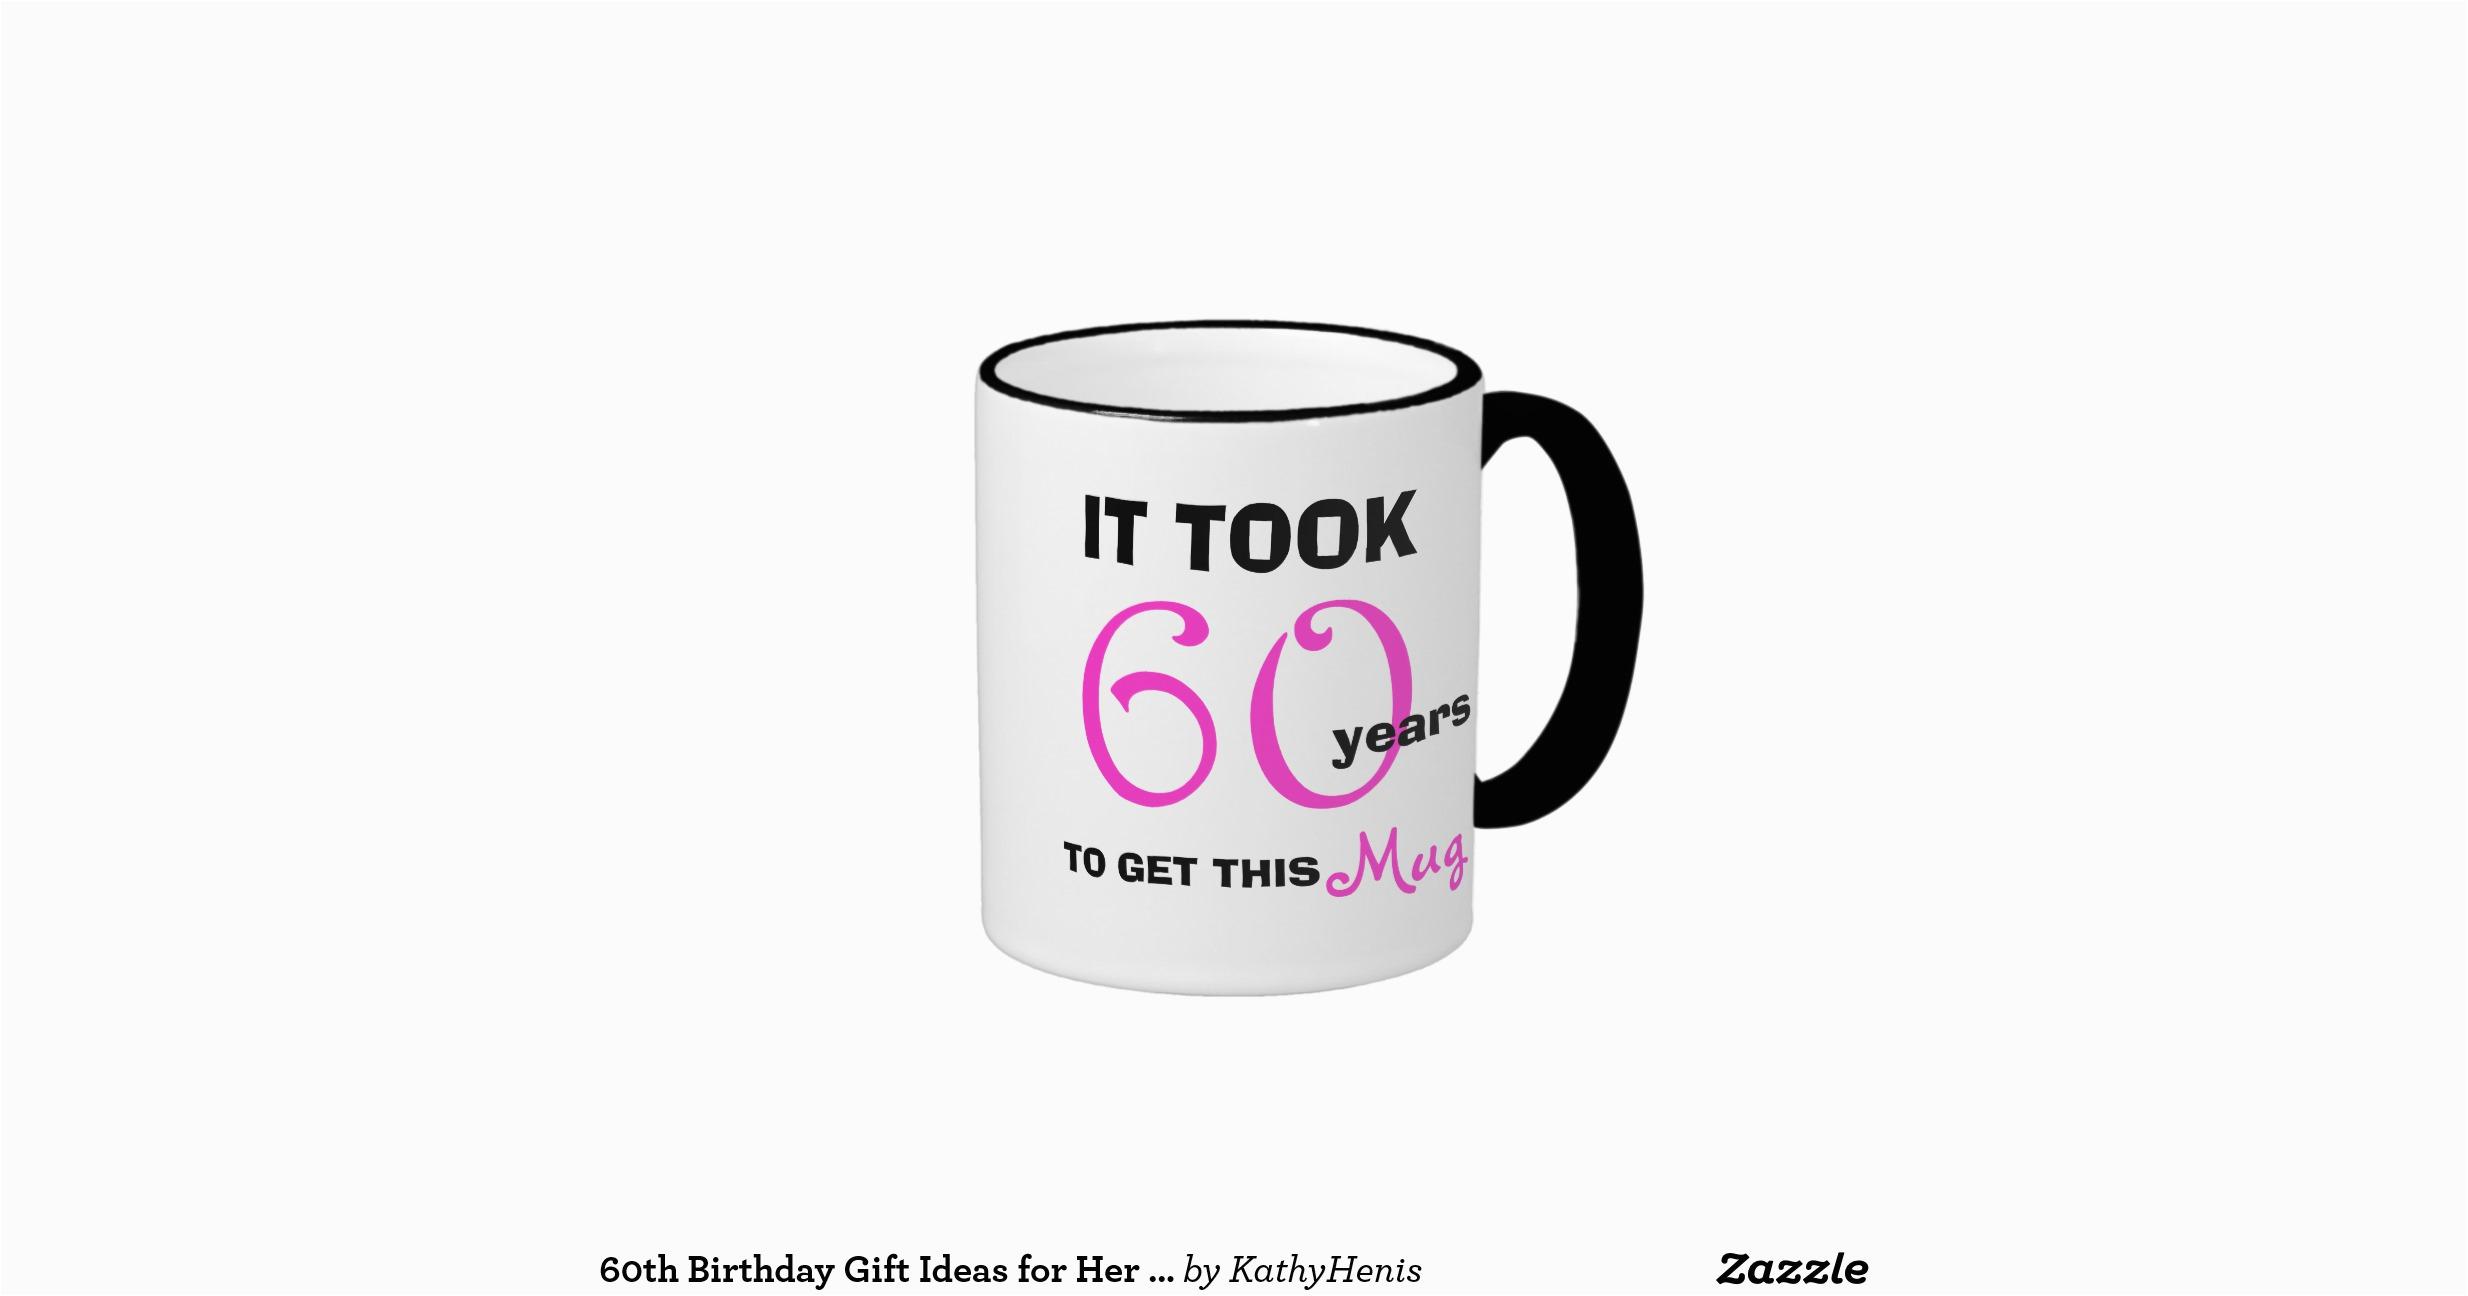 60th birthday gift ideas for her mug funny